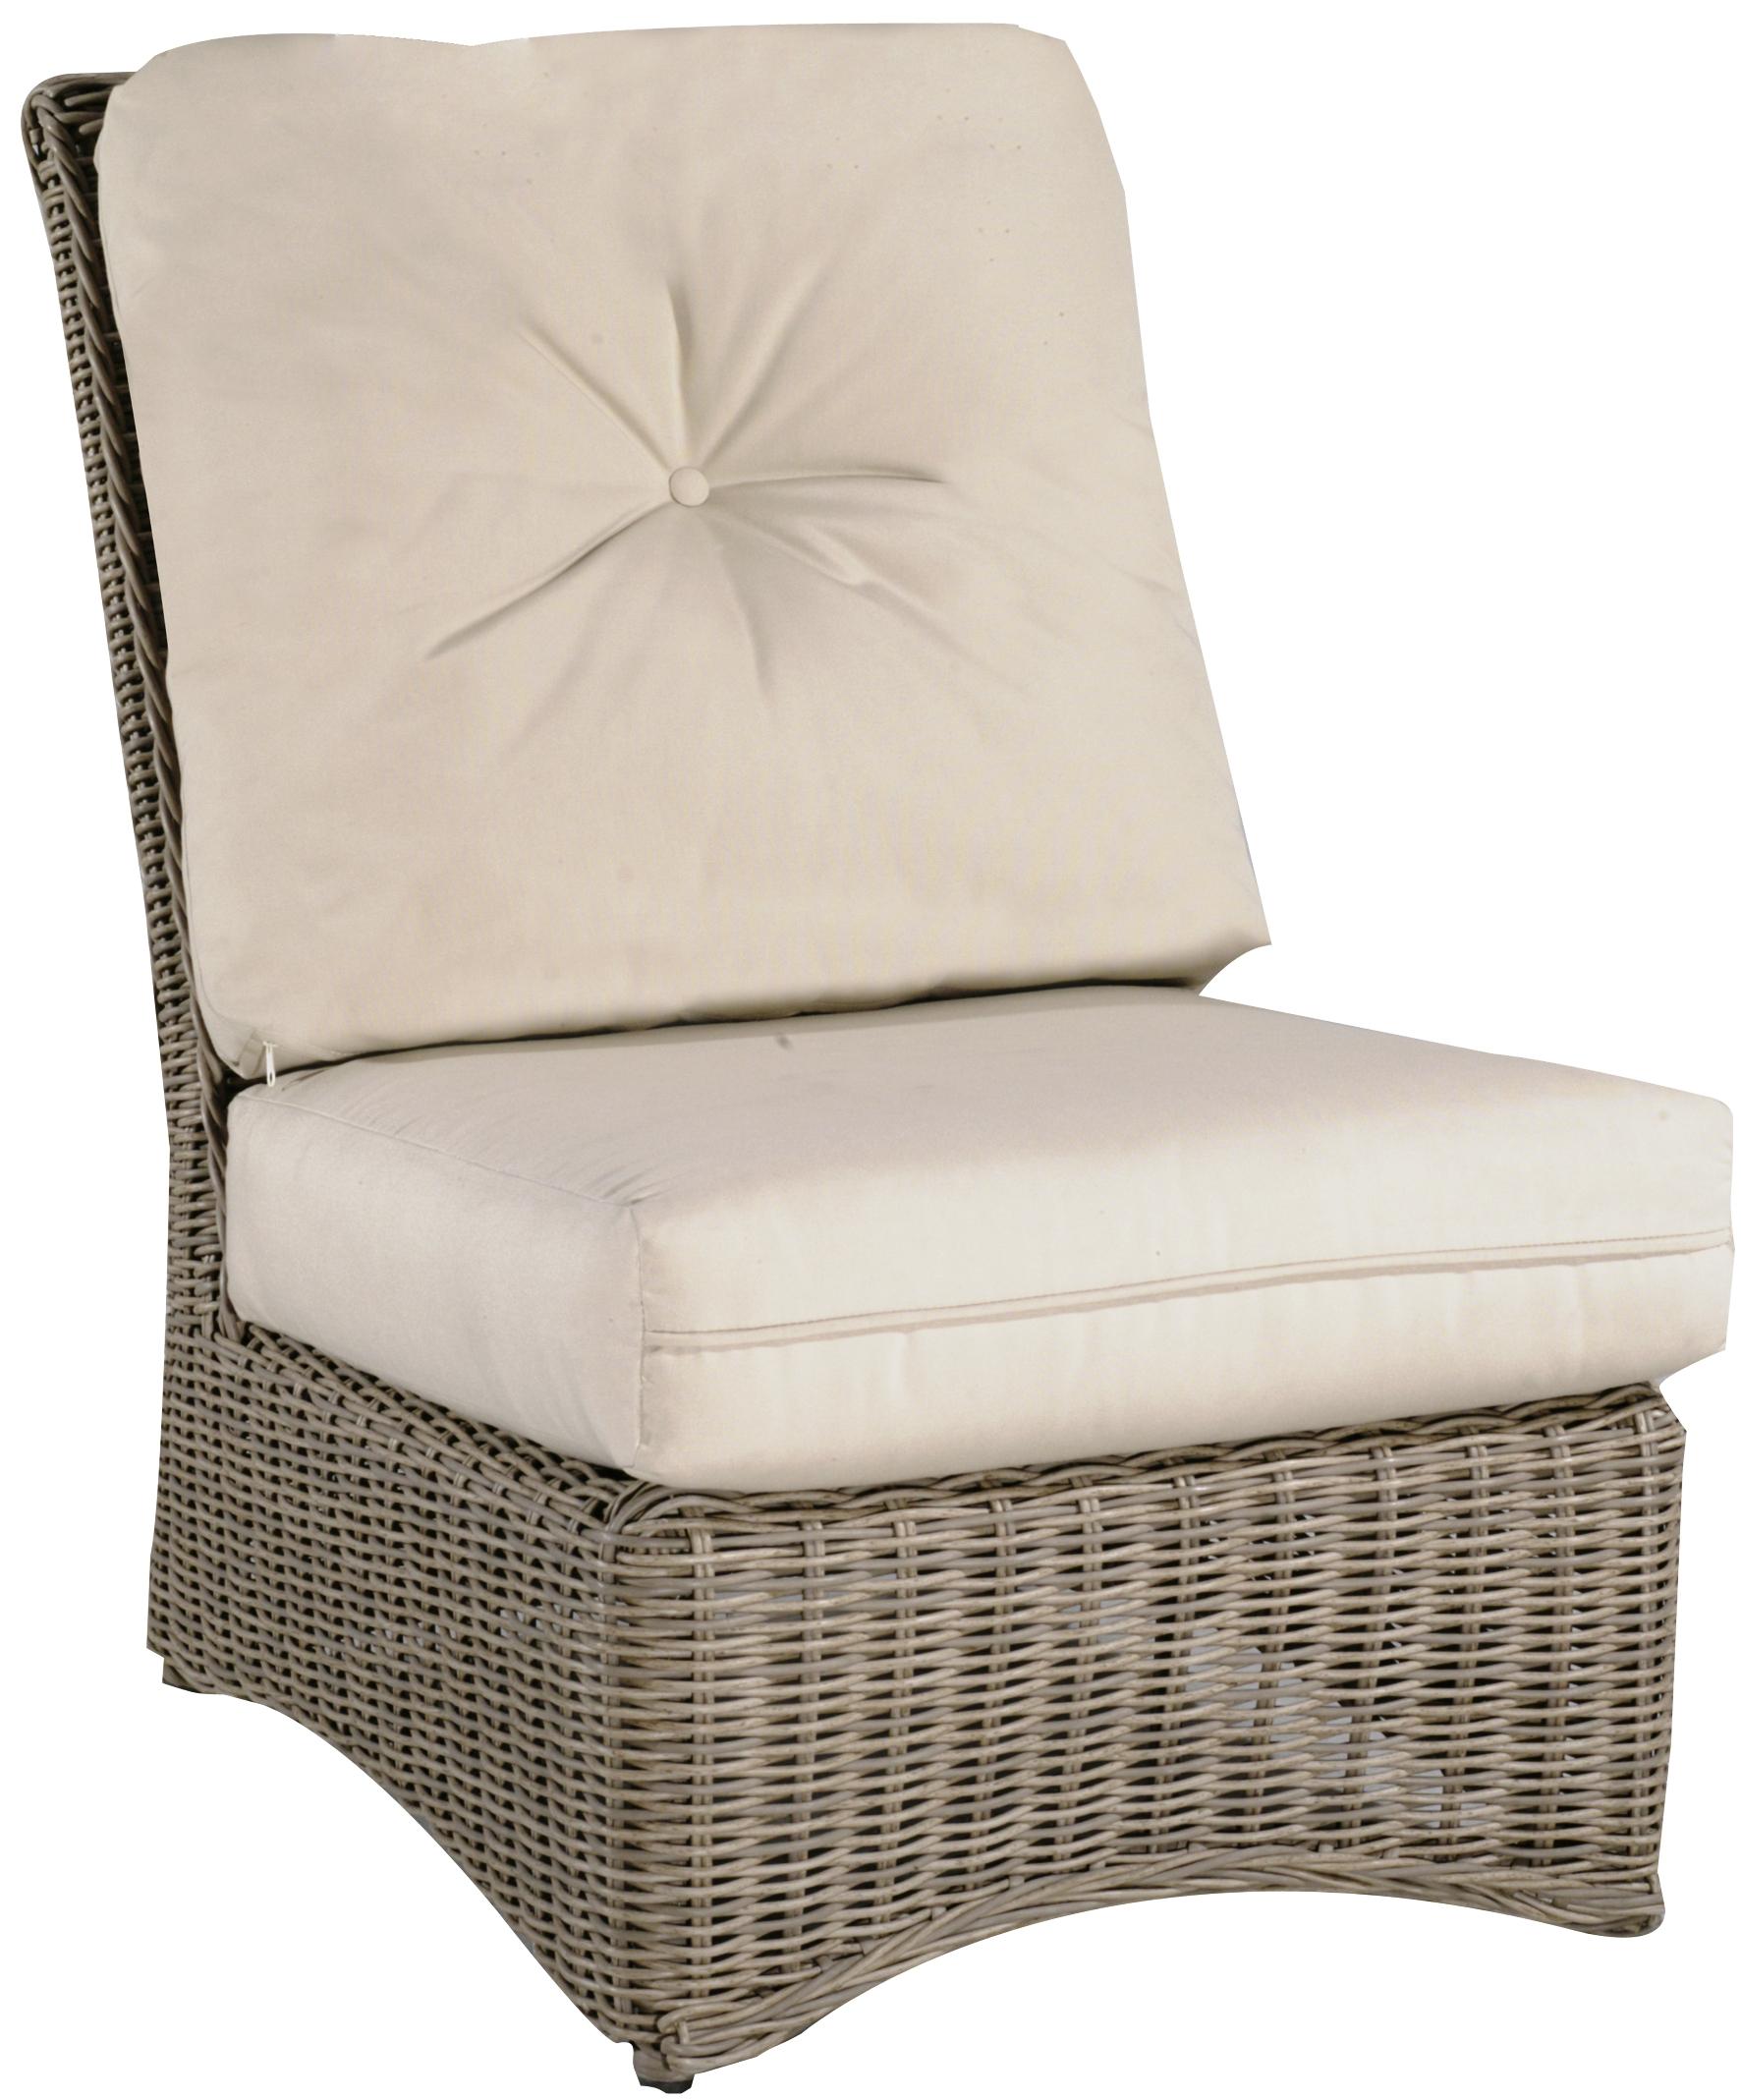 "971931A West Hampton Armless Chair   26"" x 36.2"" x 36.4"""